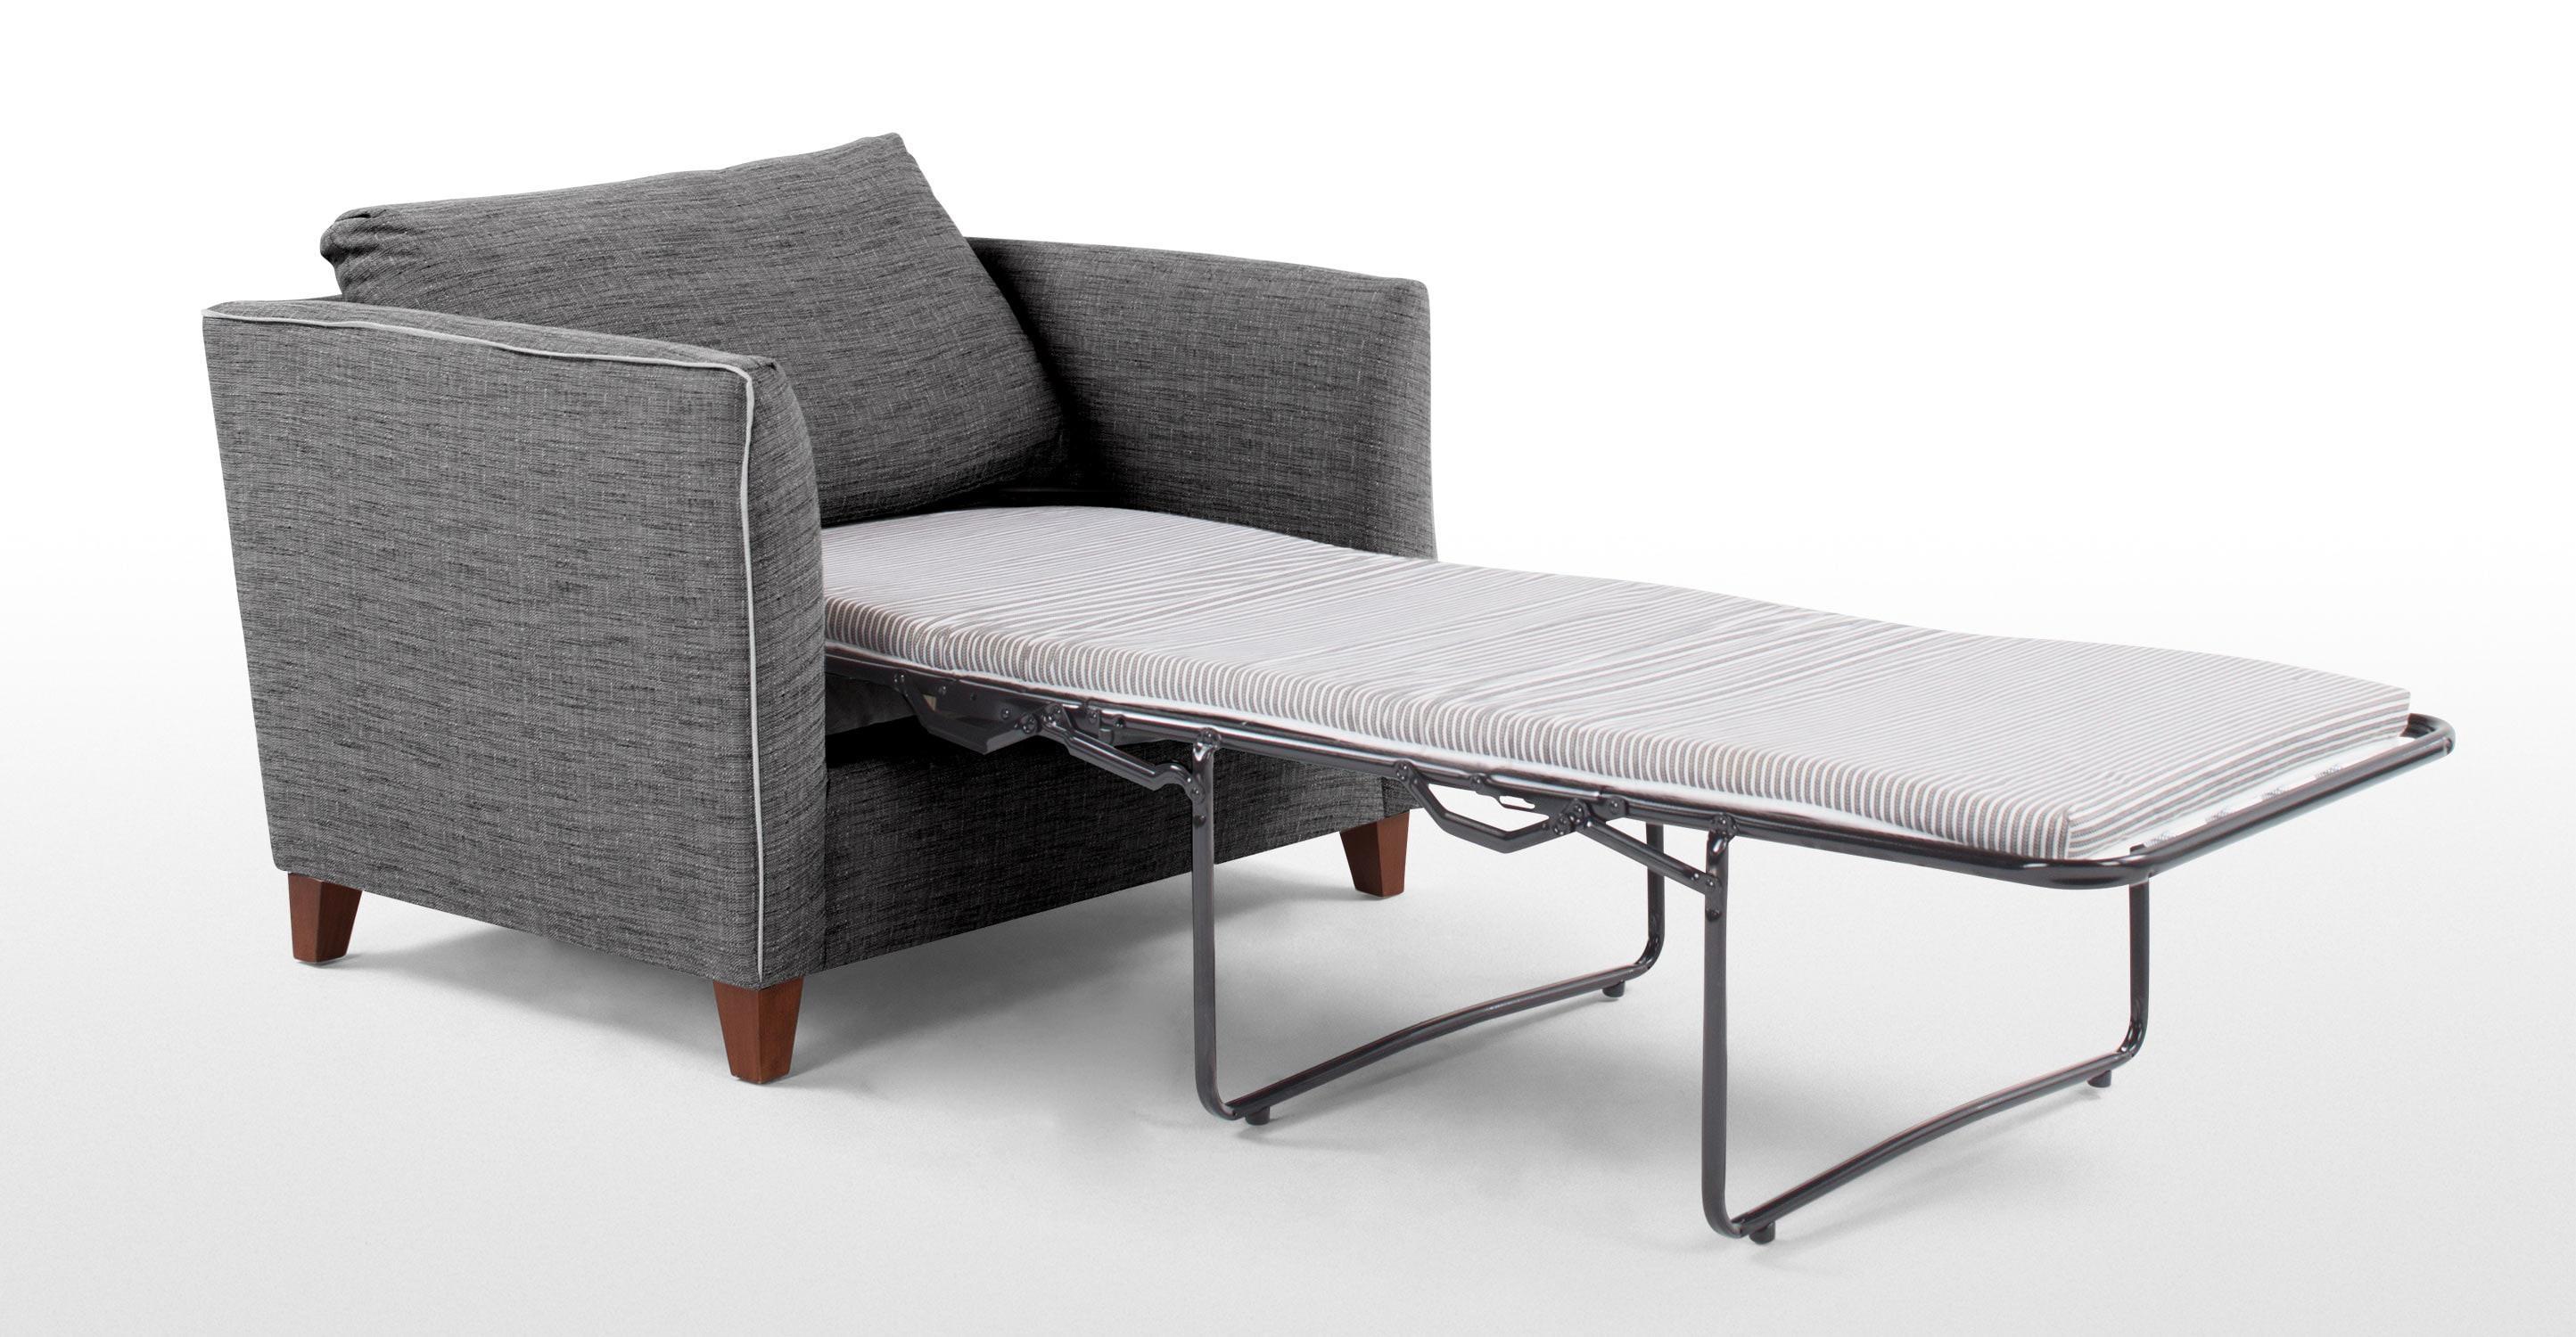 Bari Snuggler Sofa Bed, Malva Graphite | Made Regarding Single Sofa Beds (View 17 of 20)